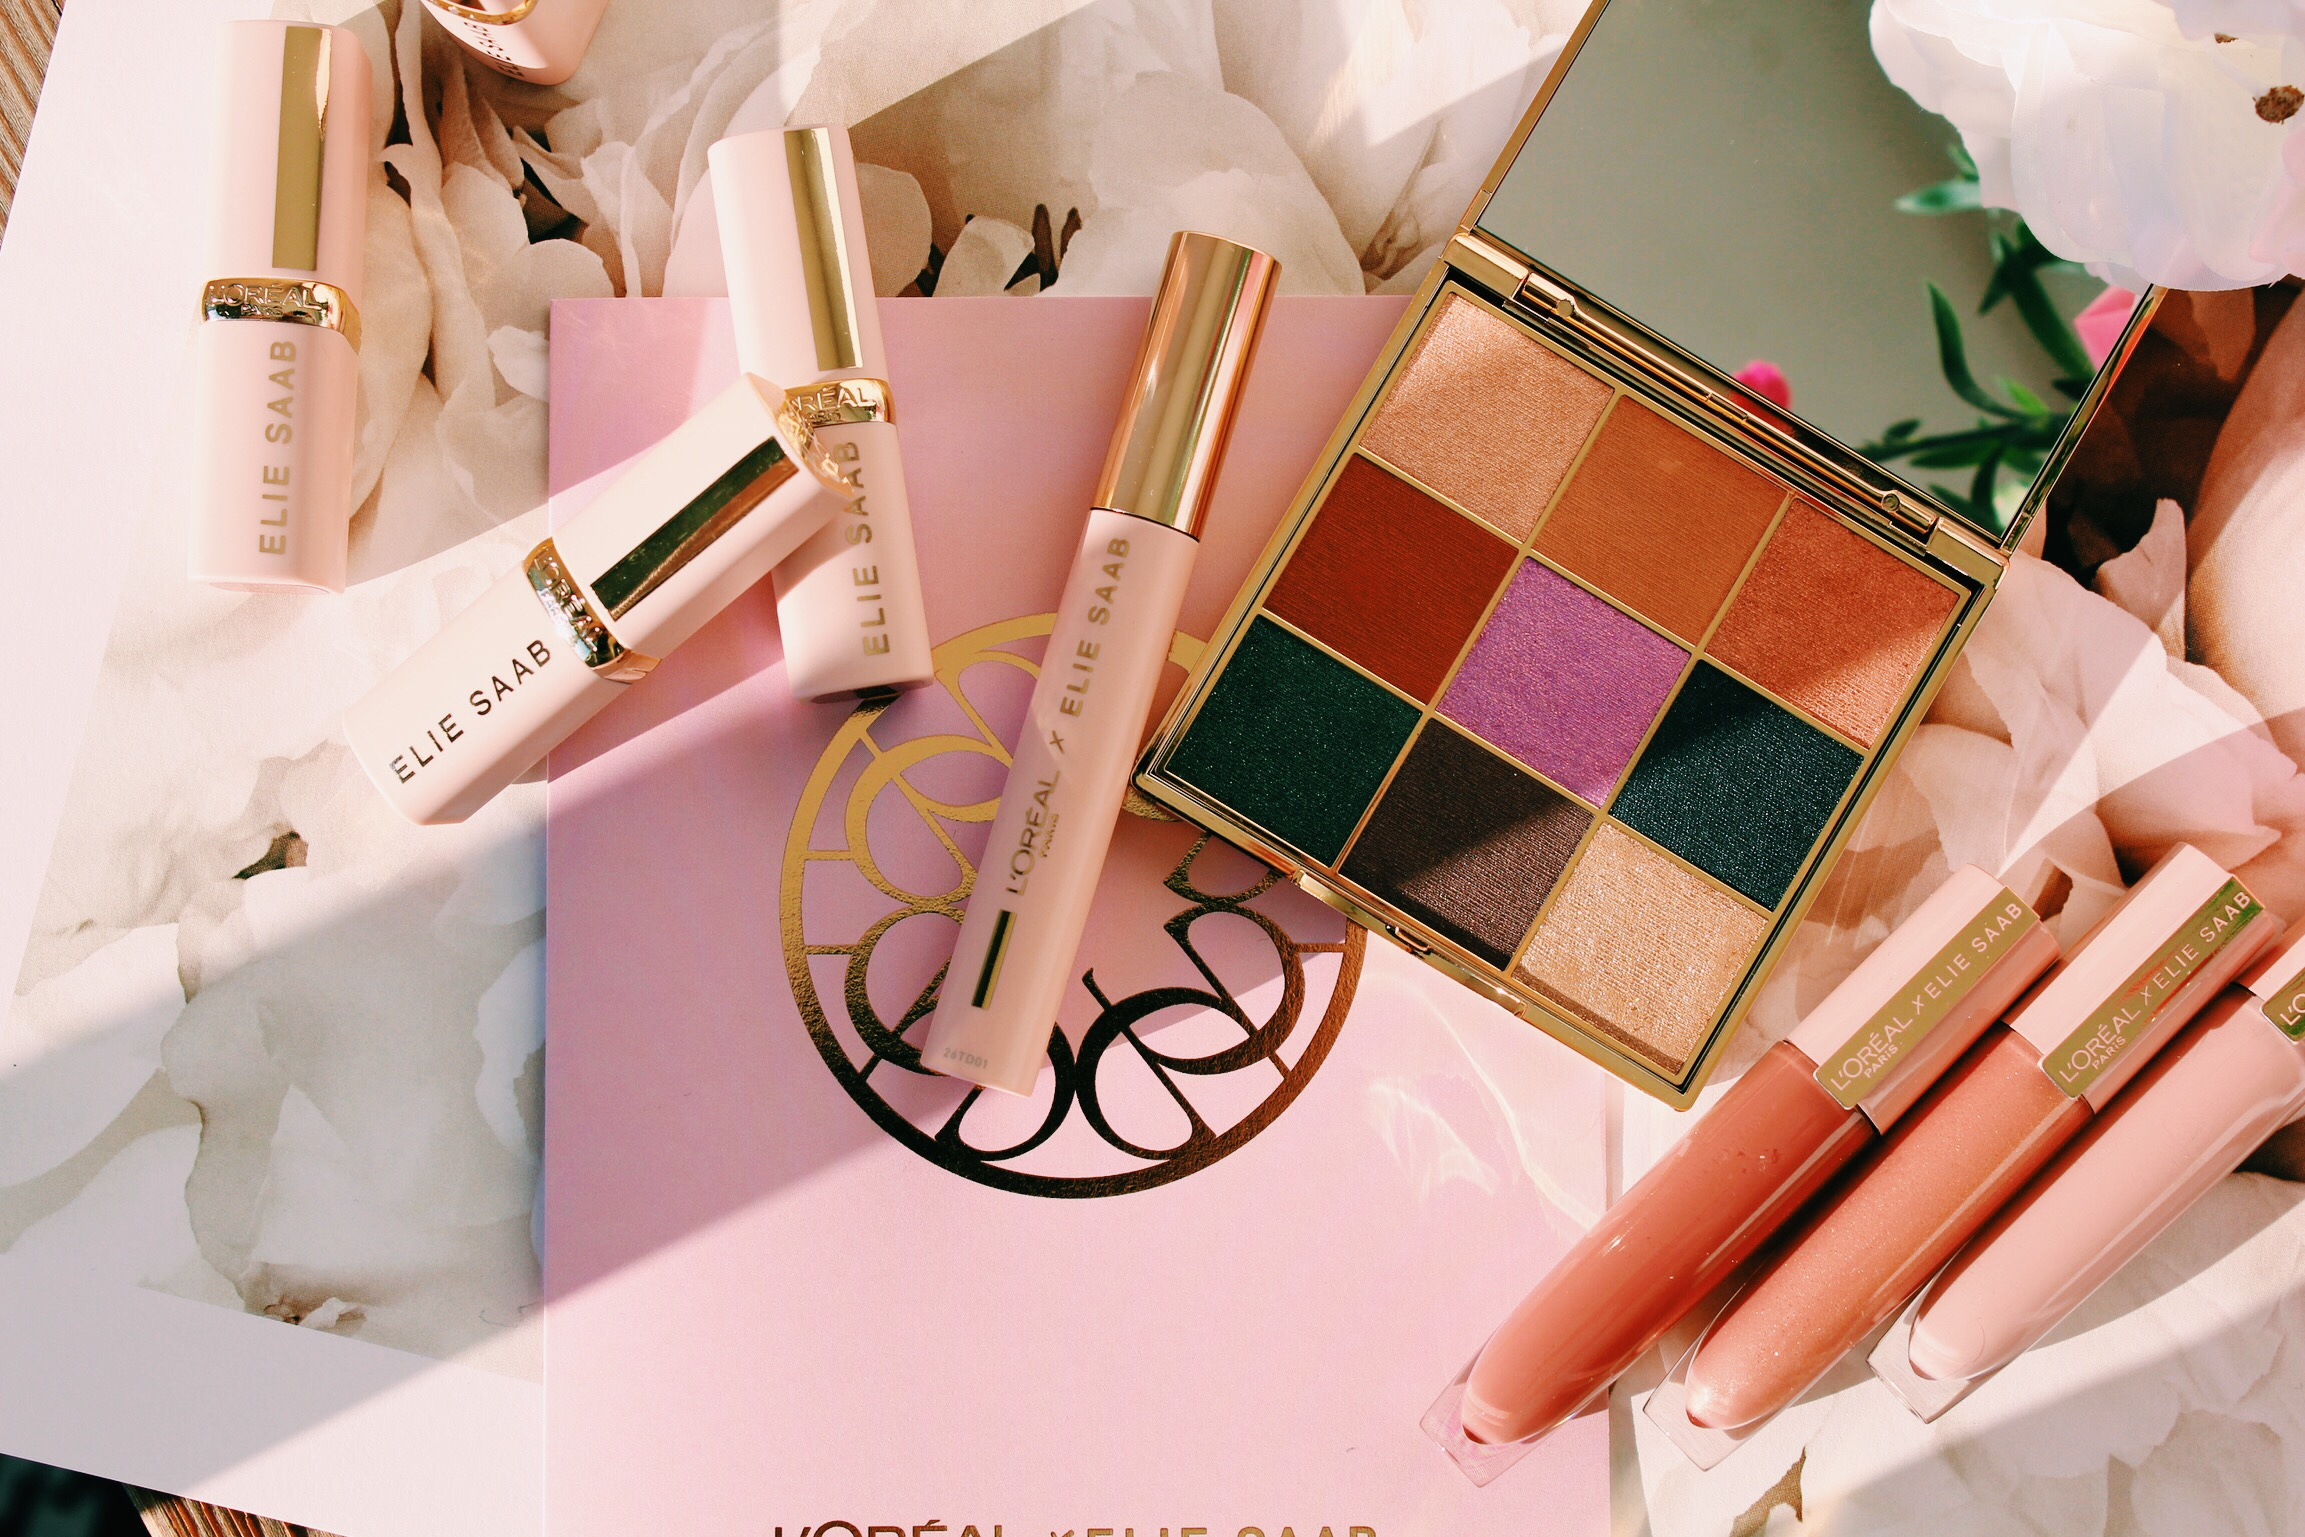 Luxuriöse Kollektion von L'Oréal x Elie Saab